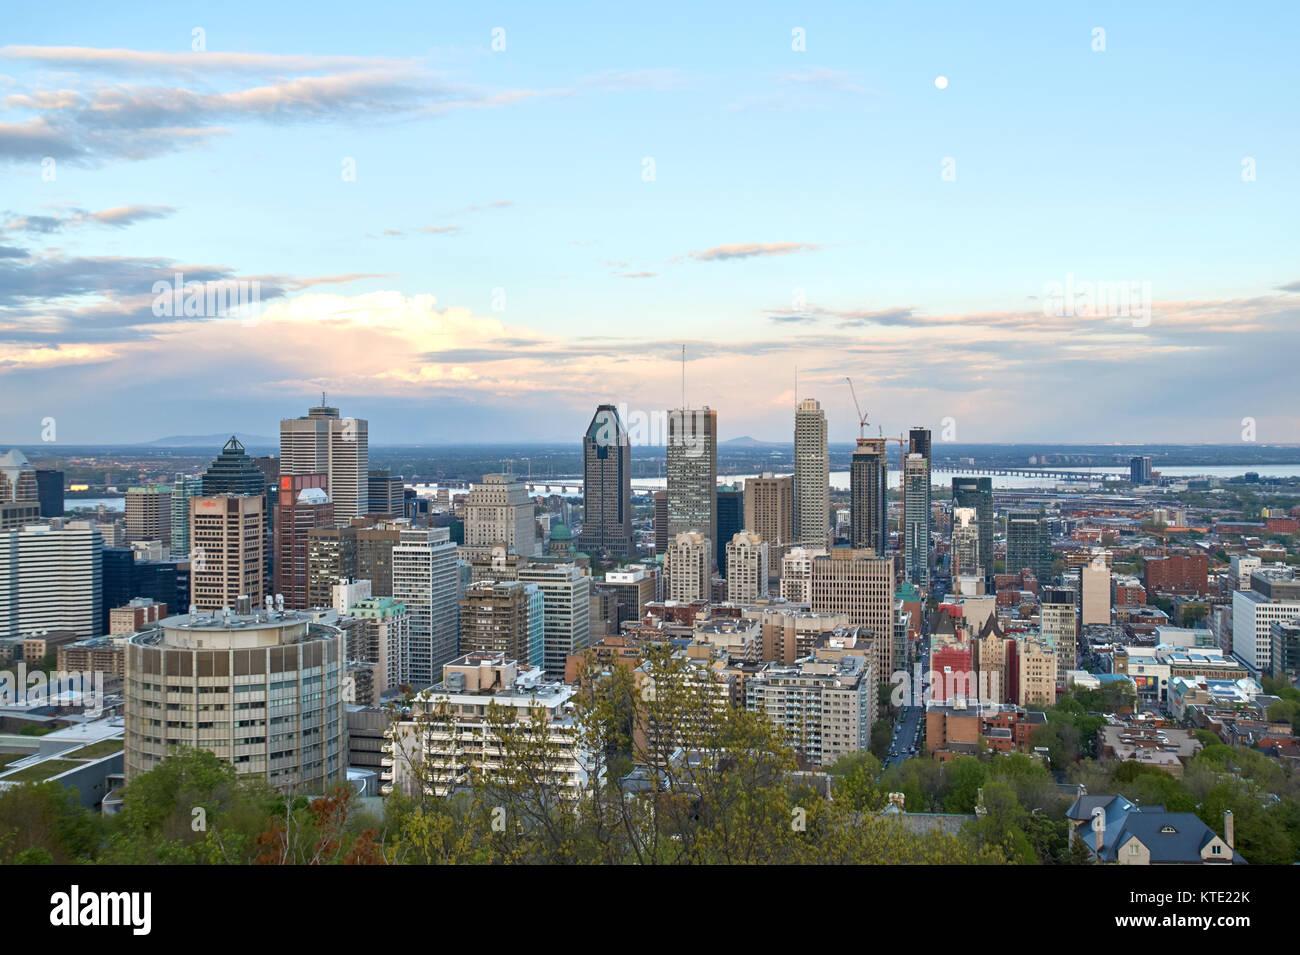 MONTREAL, KANADA - 27. MAI 2016: Malerische Aussicht auf Frühling Ausfallzeiten Montreal. Stockbild